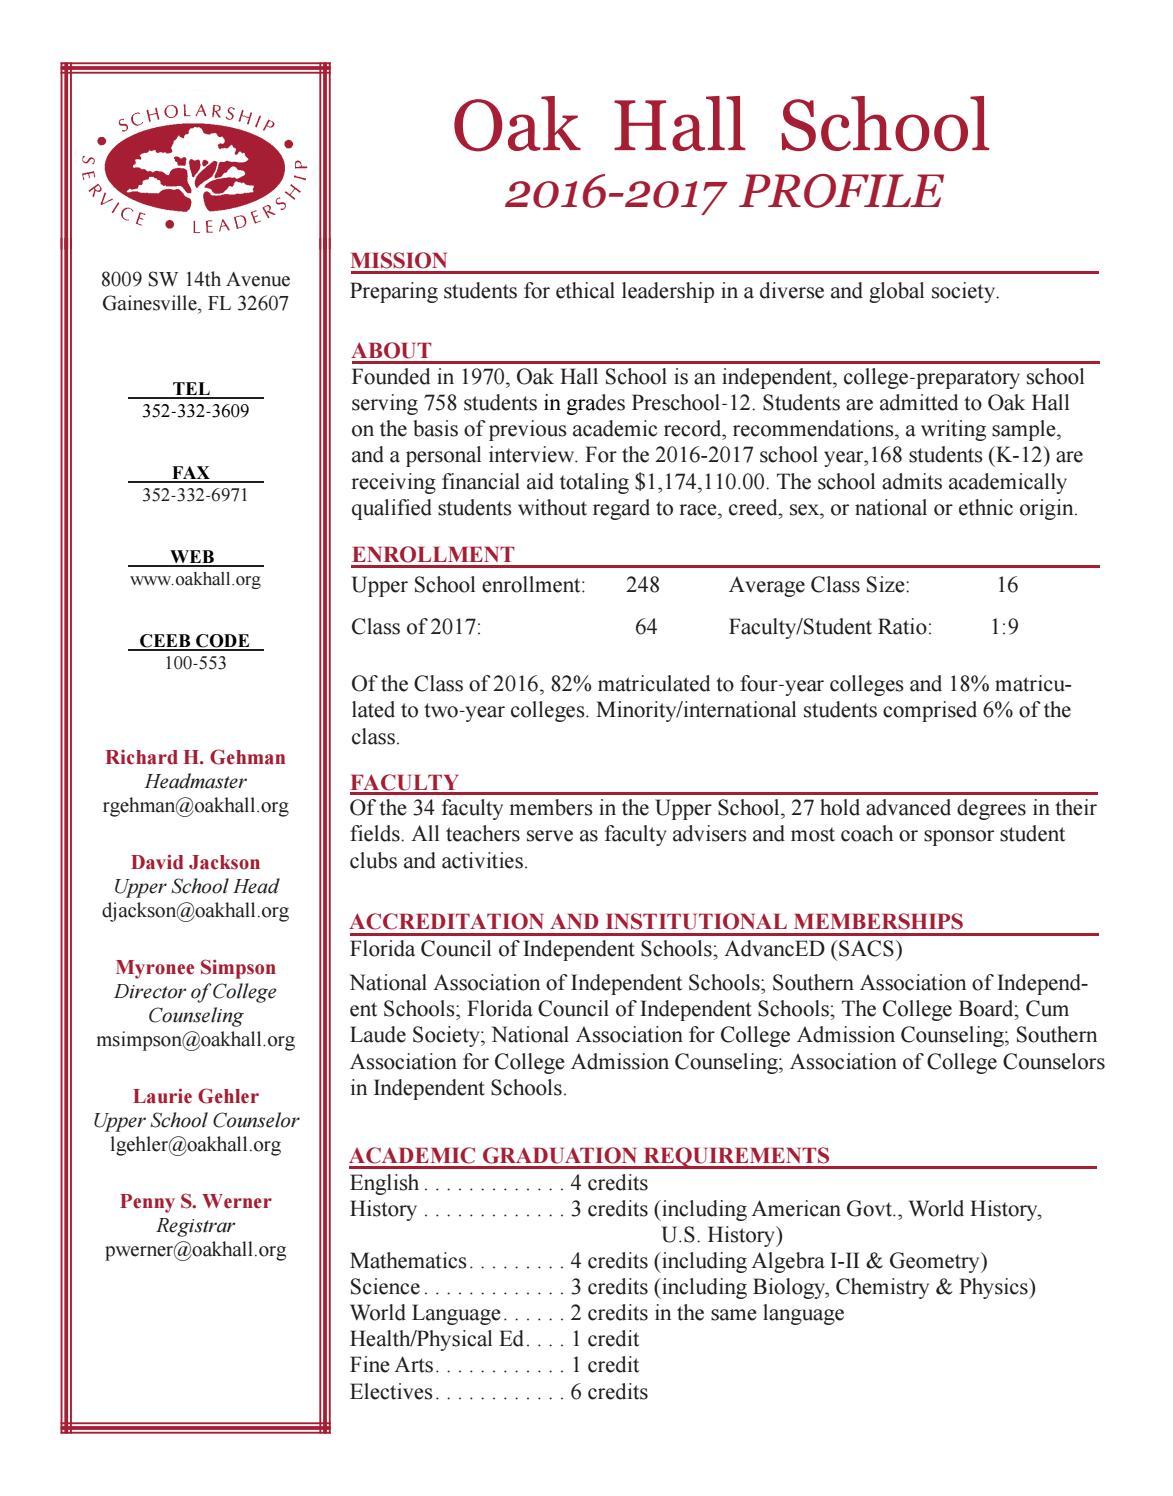 Oak Hall School Profile 2016-17 by Oak Hall School - issuu